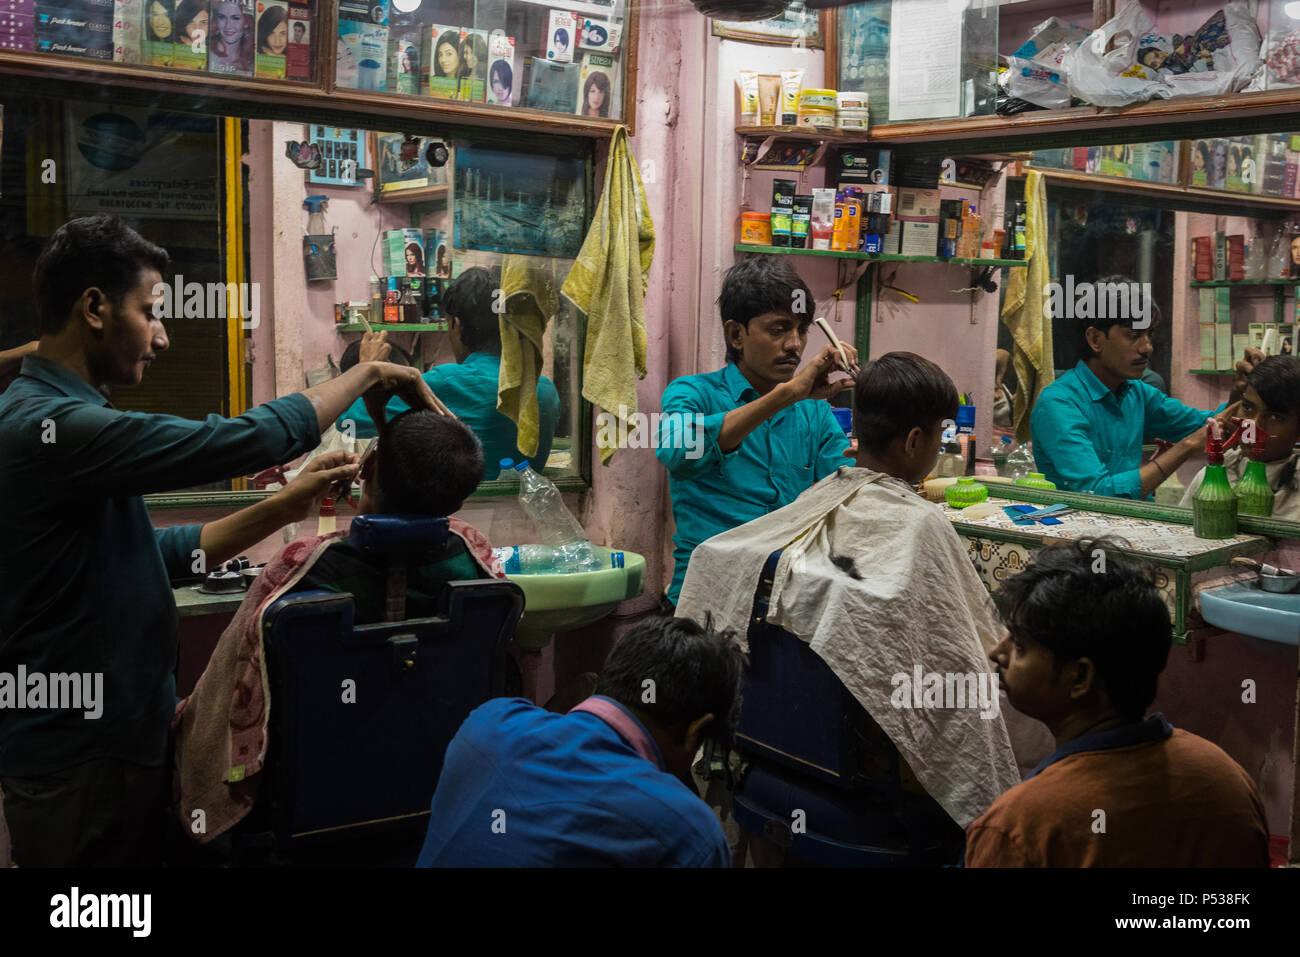 Barbers cutting hair at an outdoor barbershop in Kolkata, India